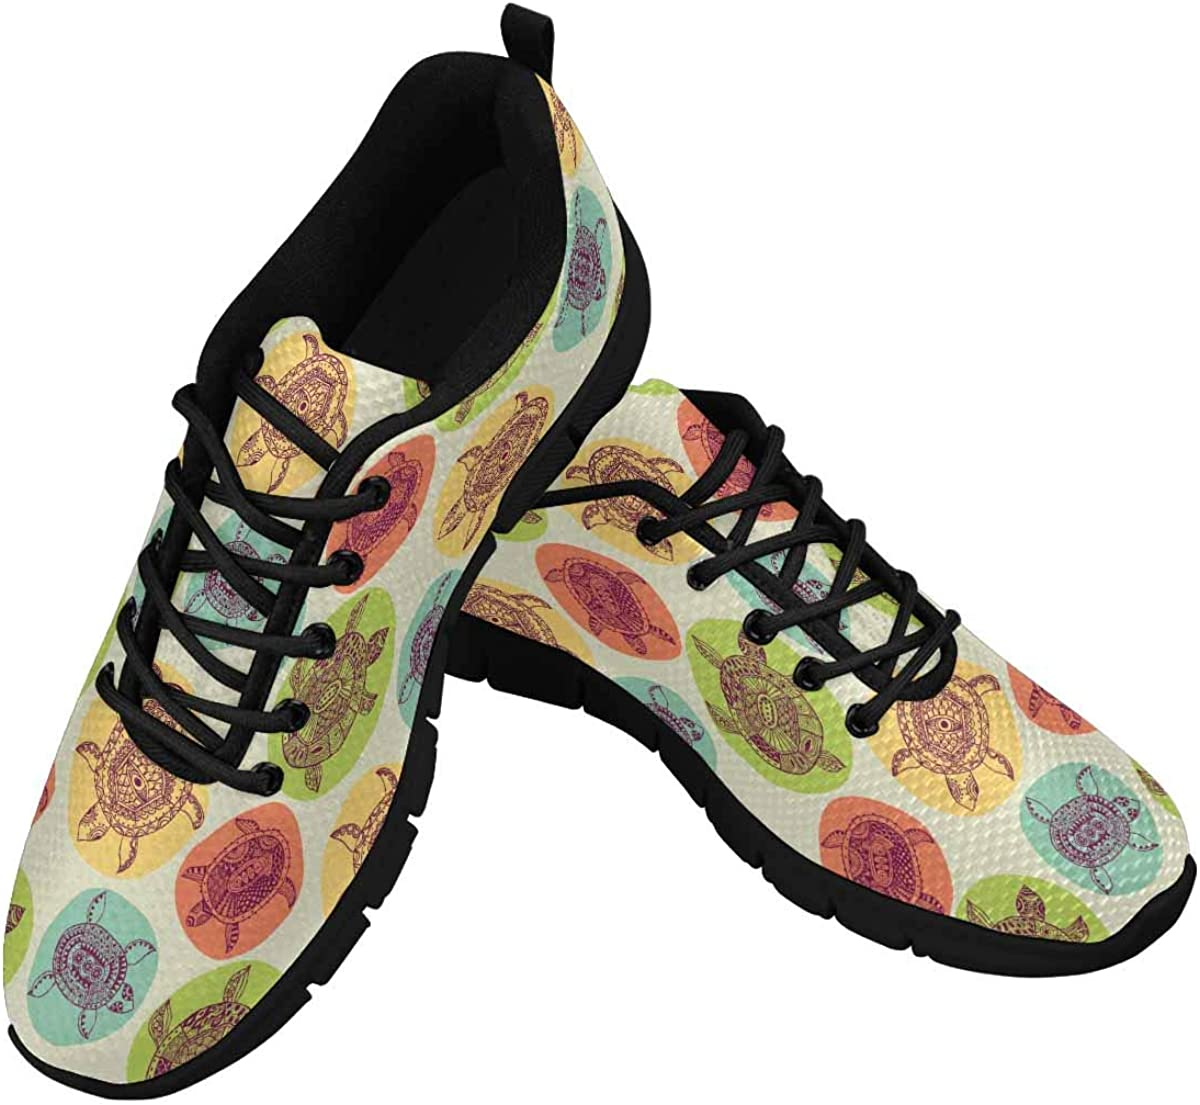 InterestPrint Cue Turtles Women Walking Shoes Comfortable Lightweight Work Casual Travel Sneakers